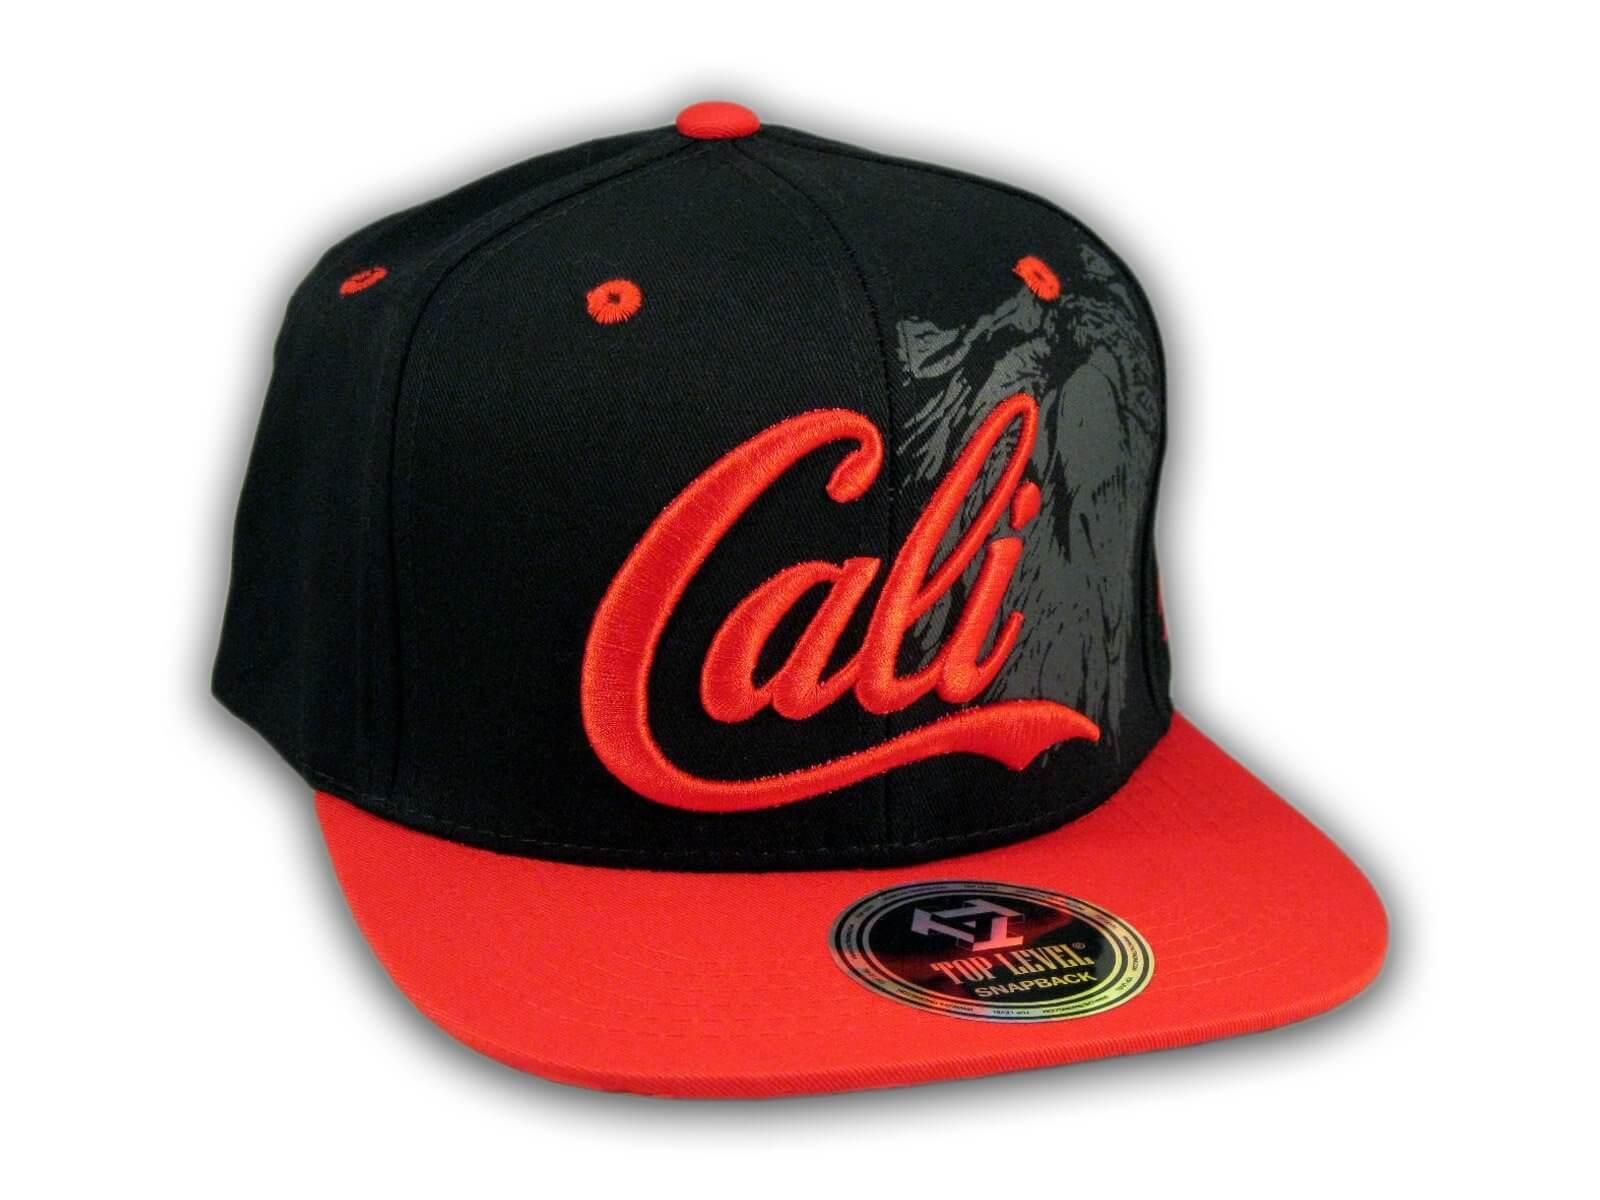 9c48fccb Black and Red Cali Bear Snapback Hat - Printed T-Shirts, Cadet Caps ...